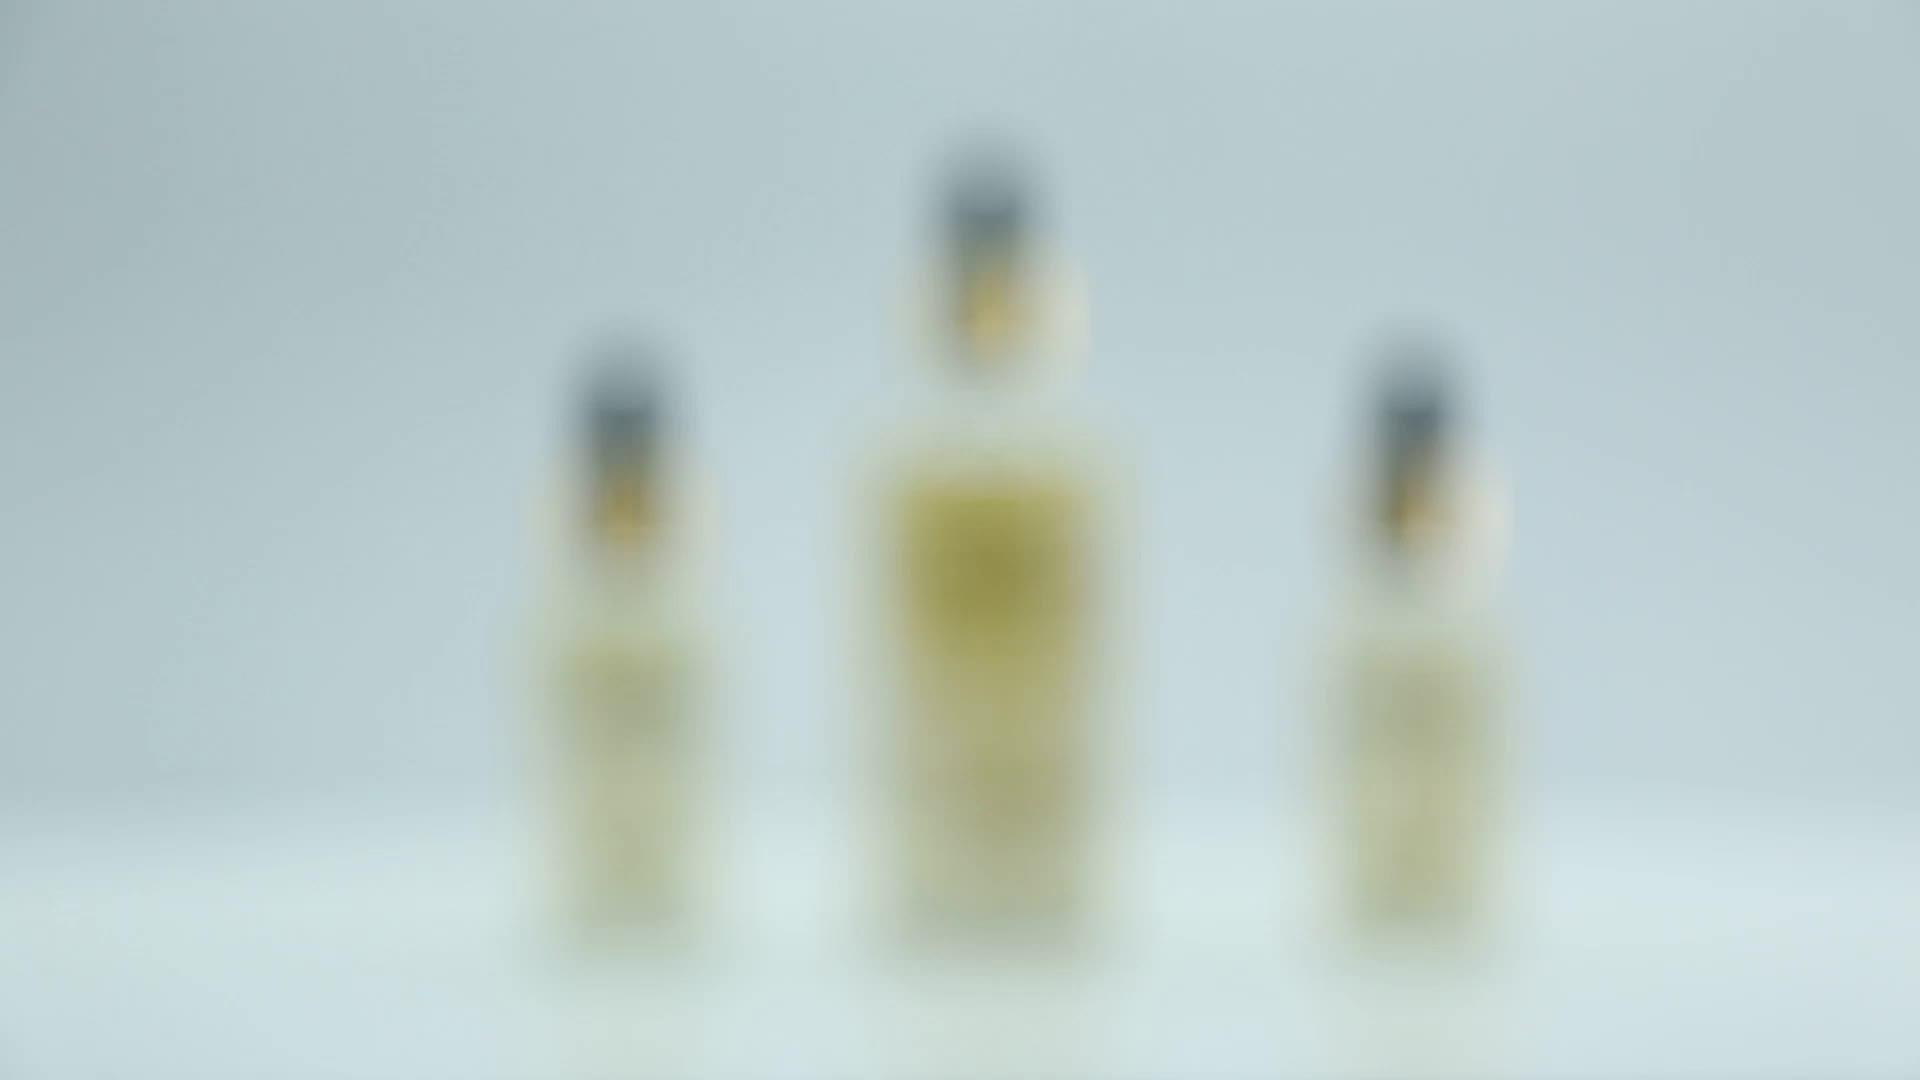 wholesale OEM/ODM private label face skin whitening 24k gold anti aging serum